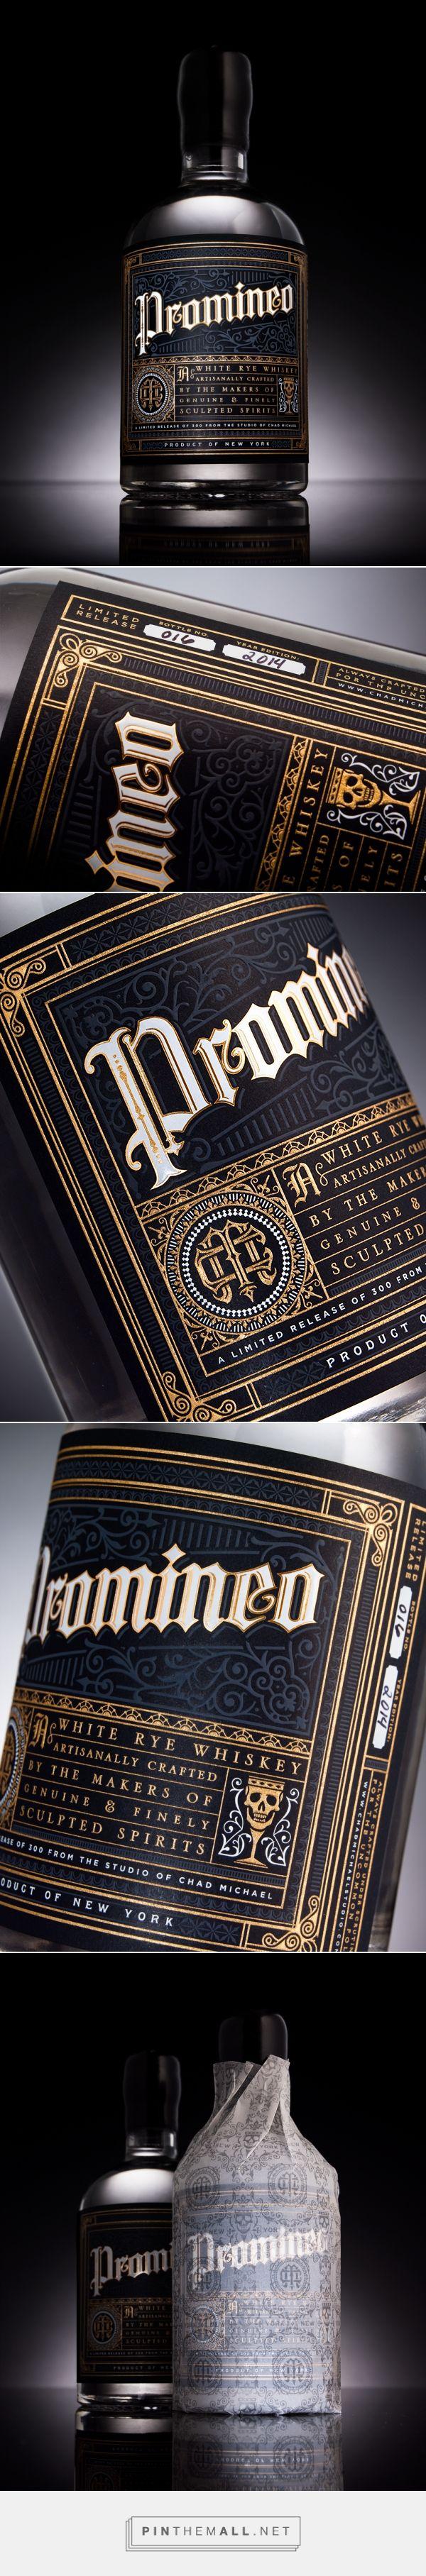 Promineo Whiskey — The Dieline - Branding & Packaging Design